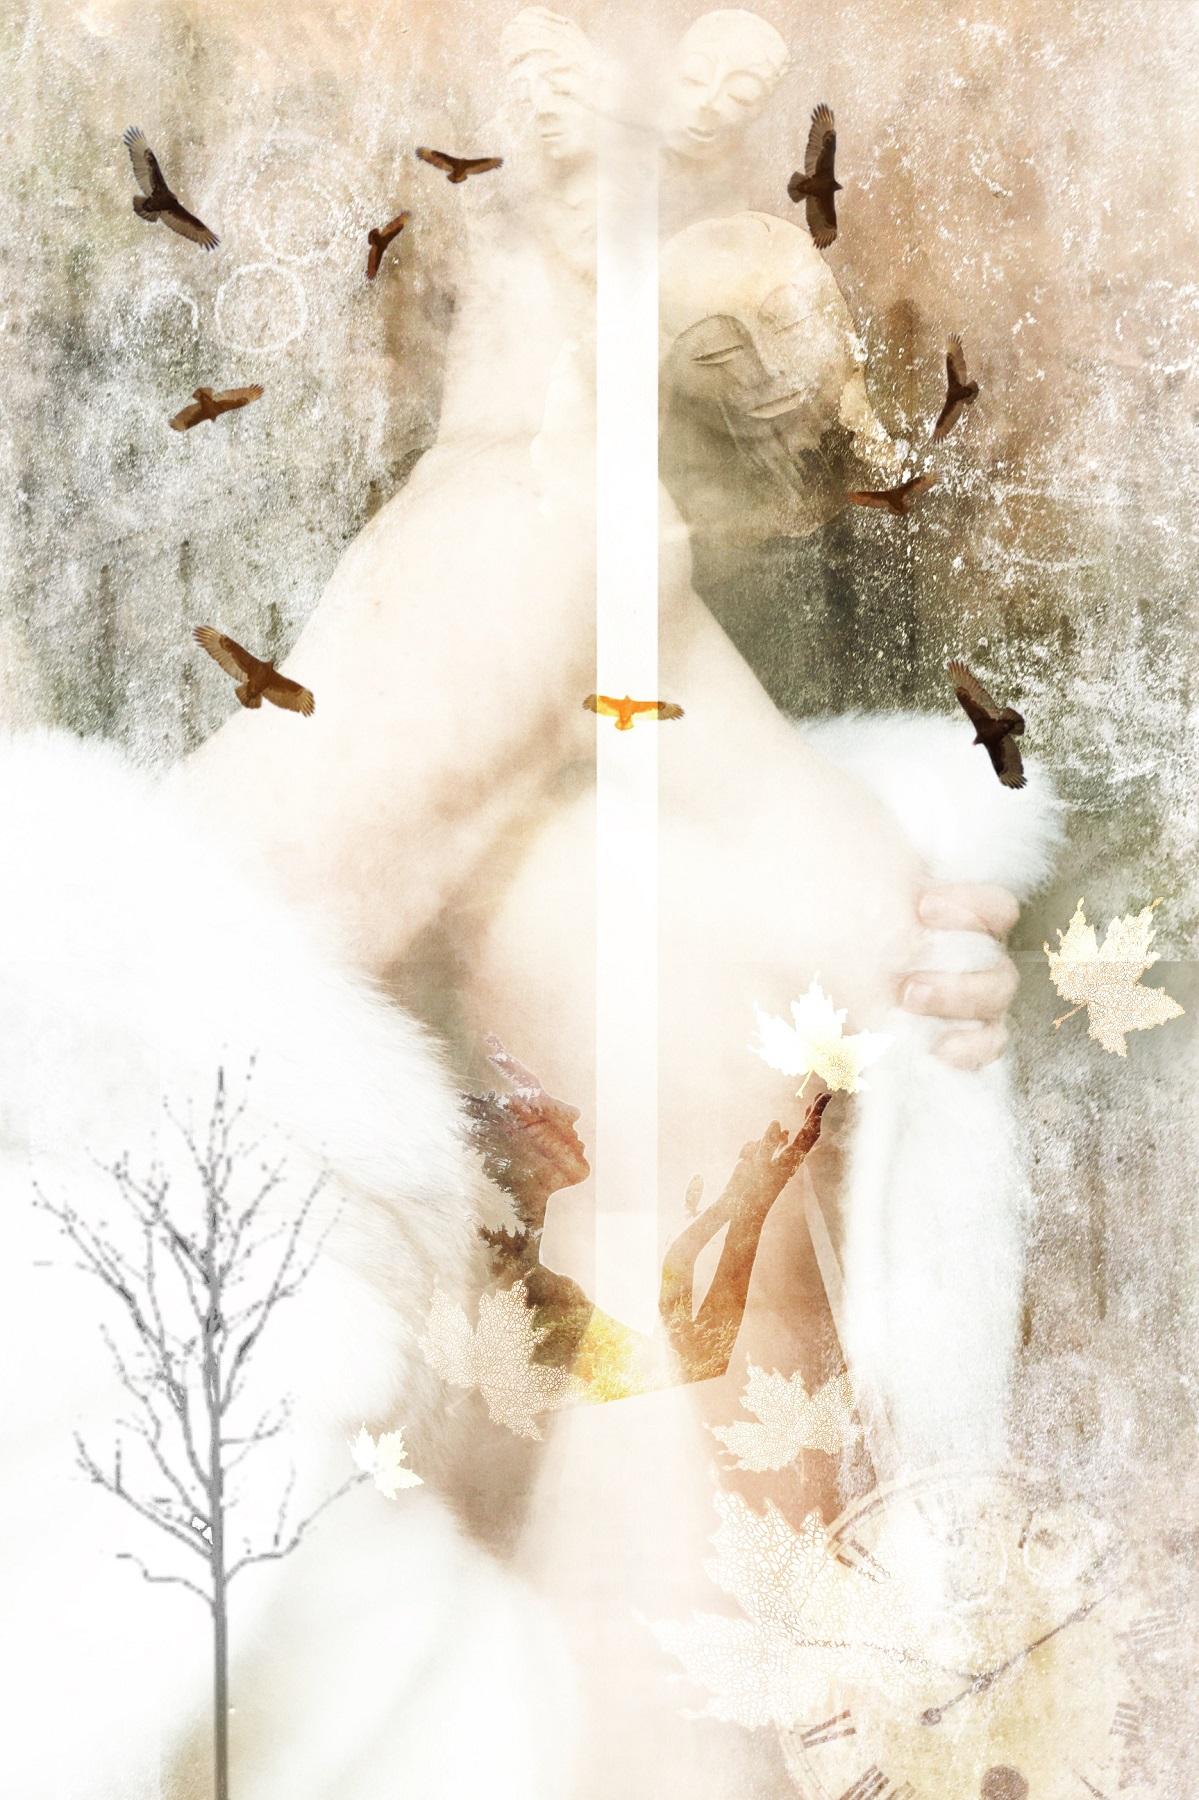 Jana_Curcio_Four Seasons_Winter_4.jpg